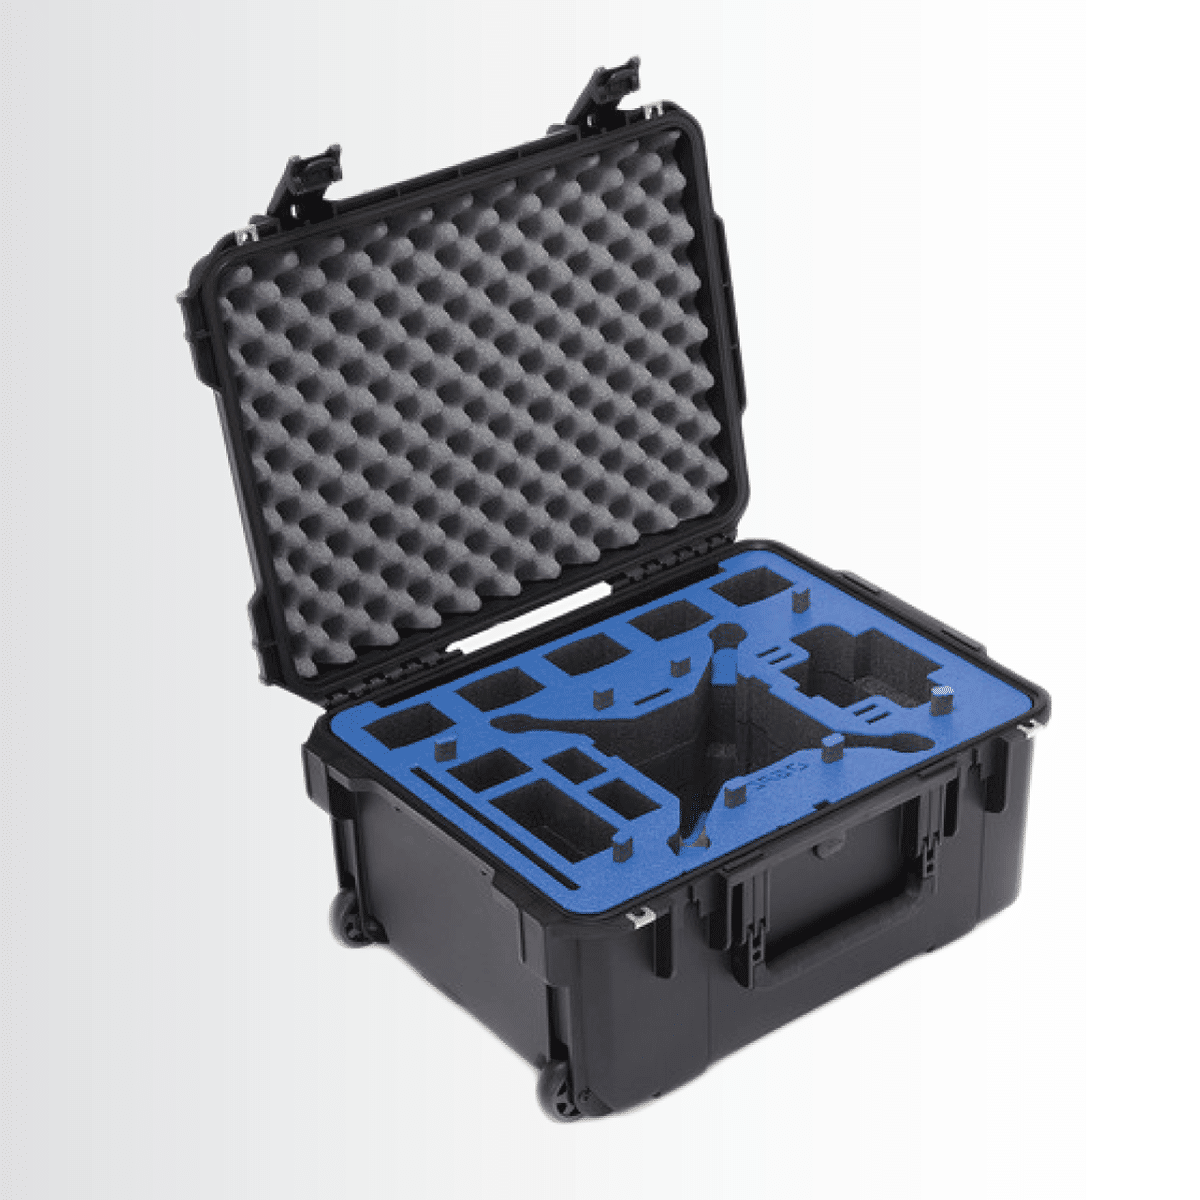 Phantom-4-pro-GPC-Case-hard-wheels